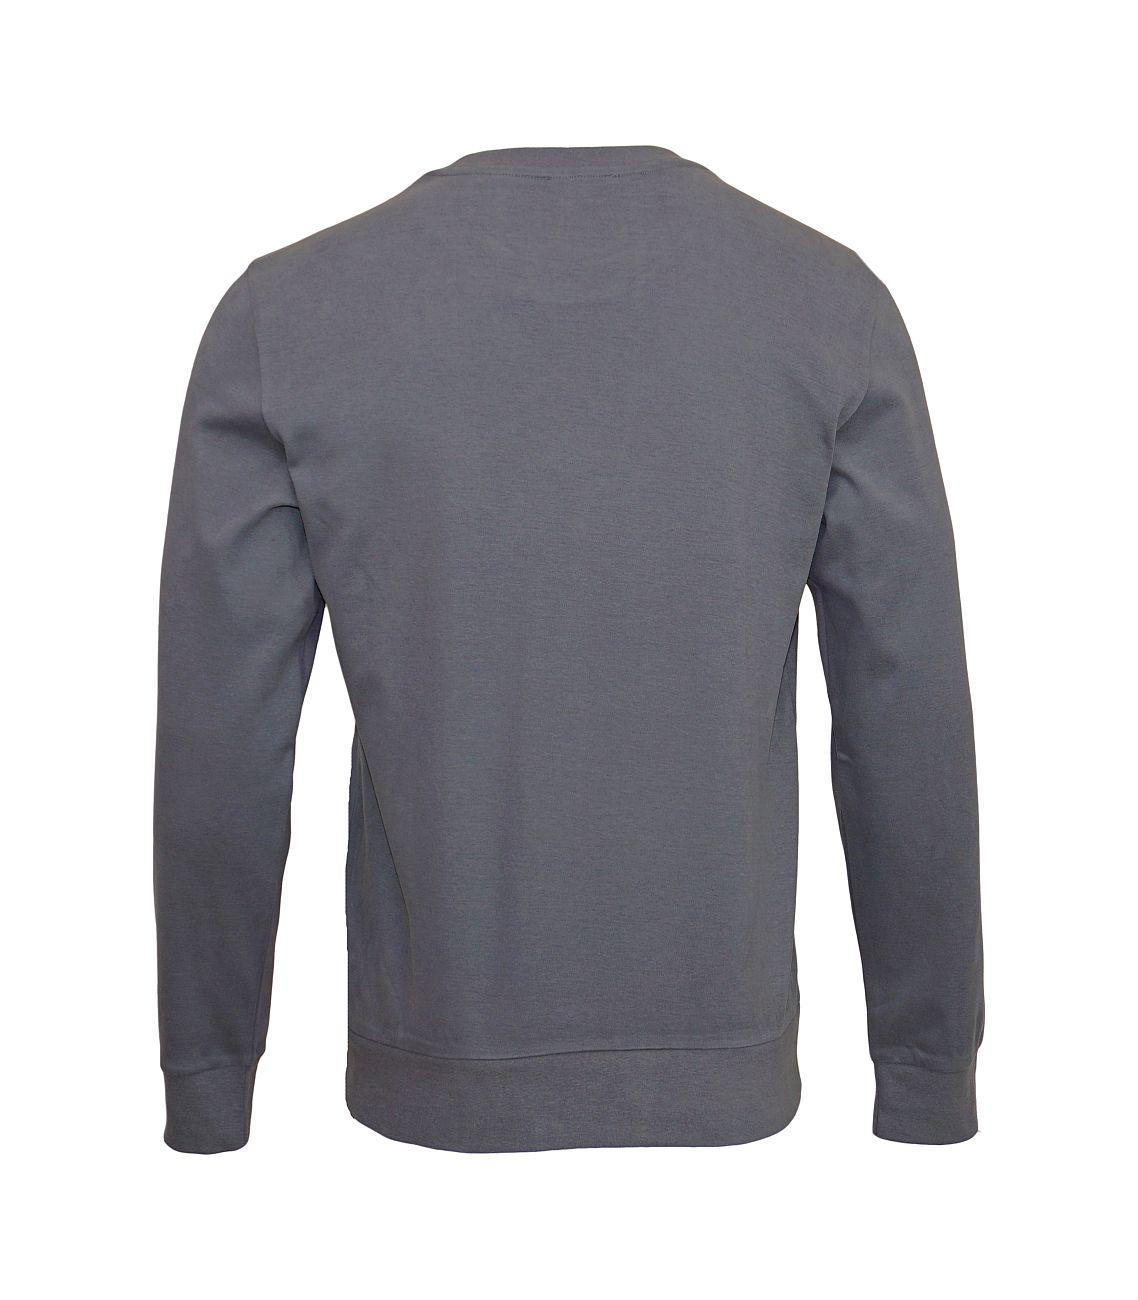 Emporio Armani Sweater Pullover Rundhals 111785 8A562 00044 ANTRACITE WX18-EAS